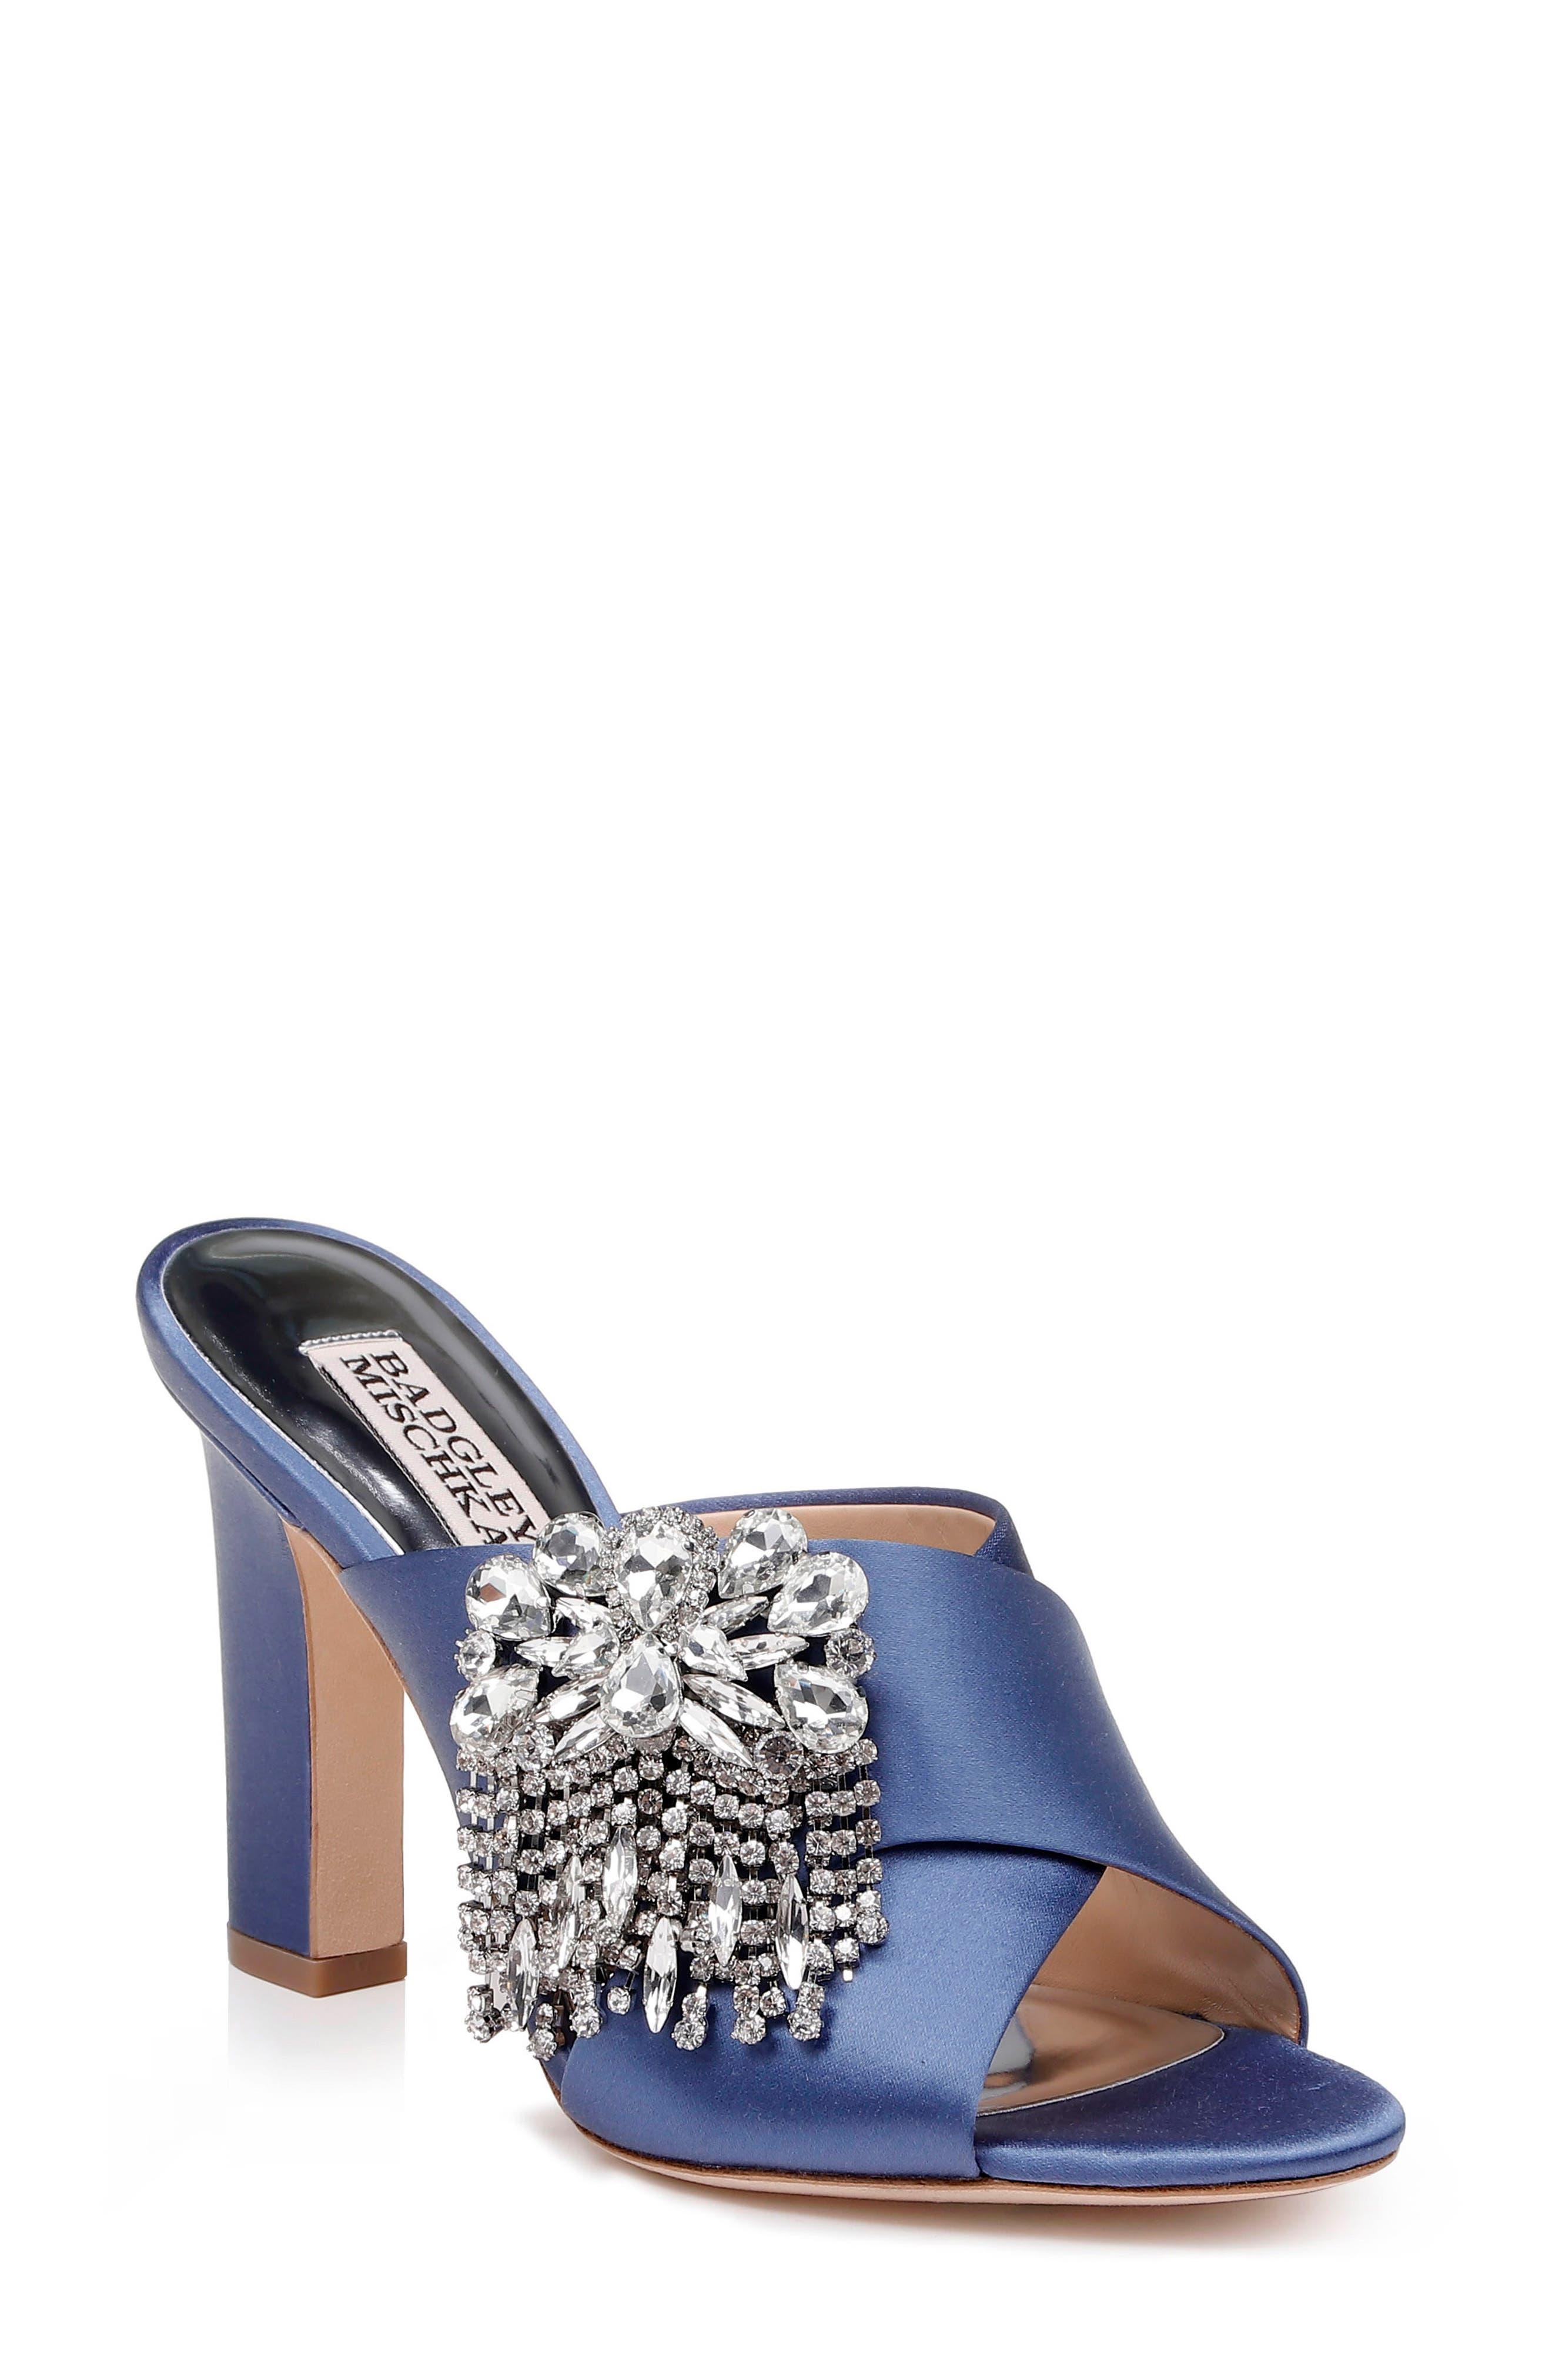 Badgley Mischka Farrah Sandal, Main, color, ITALIAN BLUE SATIN